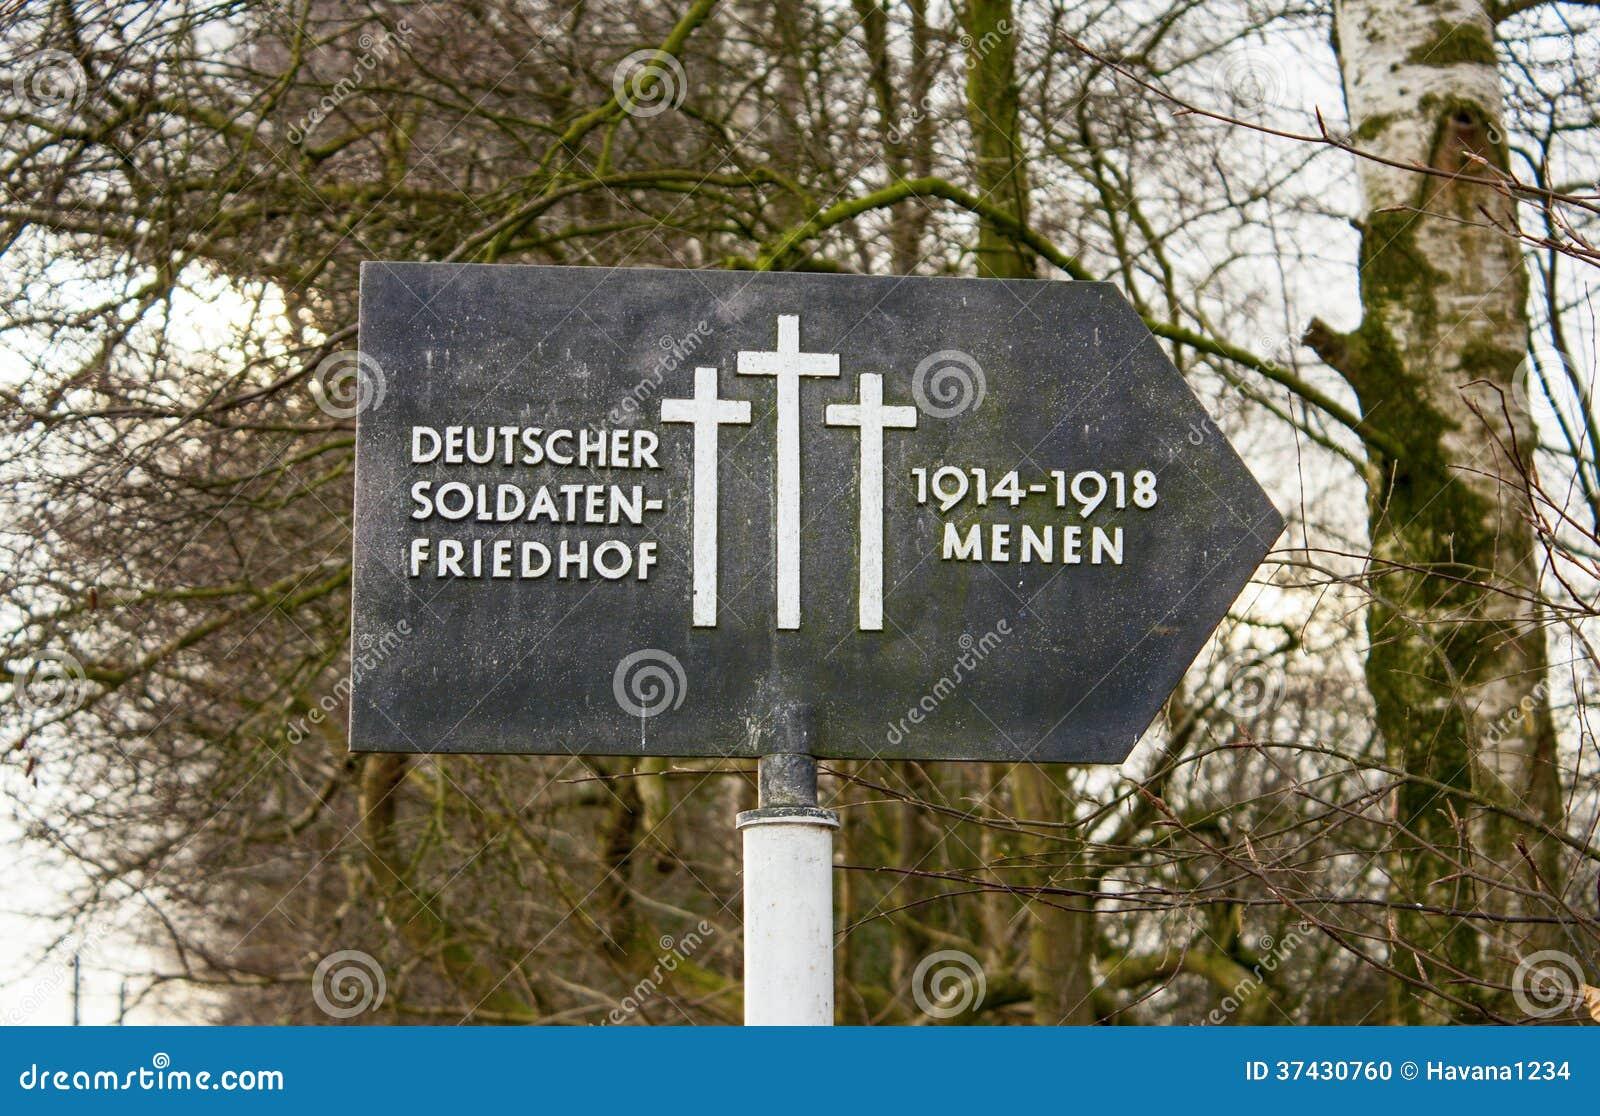 Deutsches Kirchhof friedhof auf Flandern-Gebieten menen Belgien